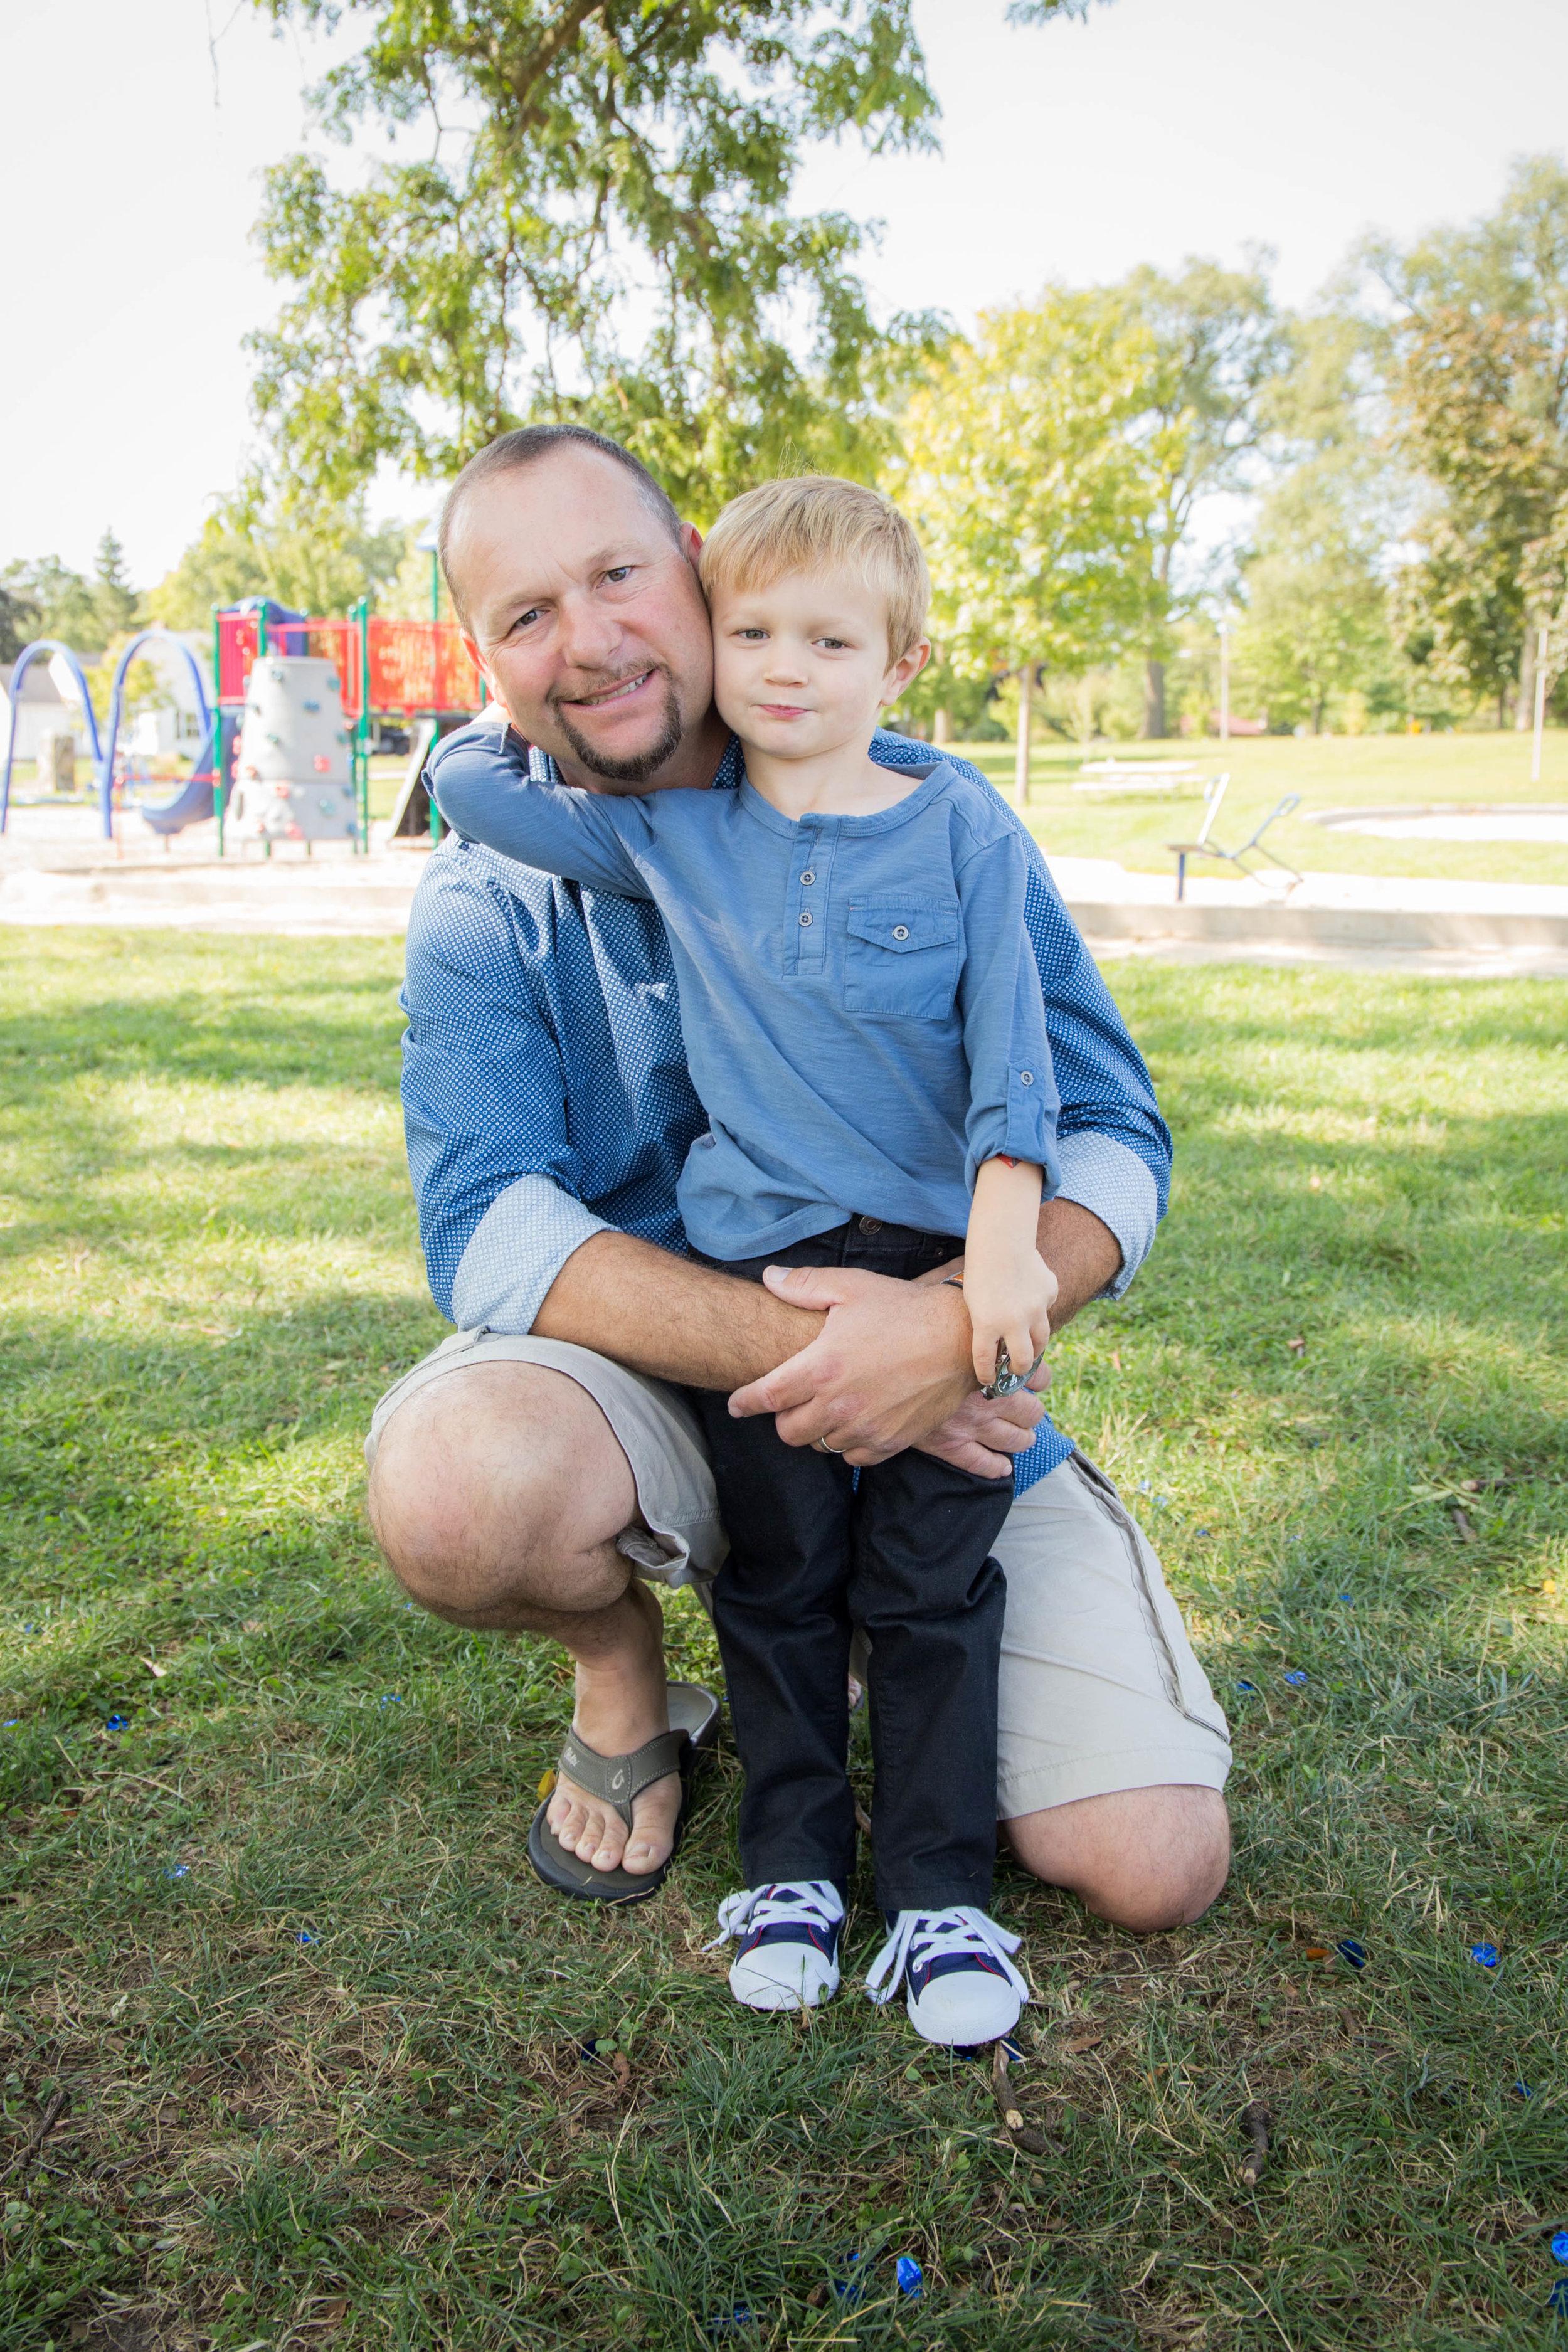 familyportraits-kidscandids-whitewaterwi-katydaixonphotography-14.jpg